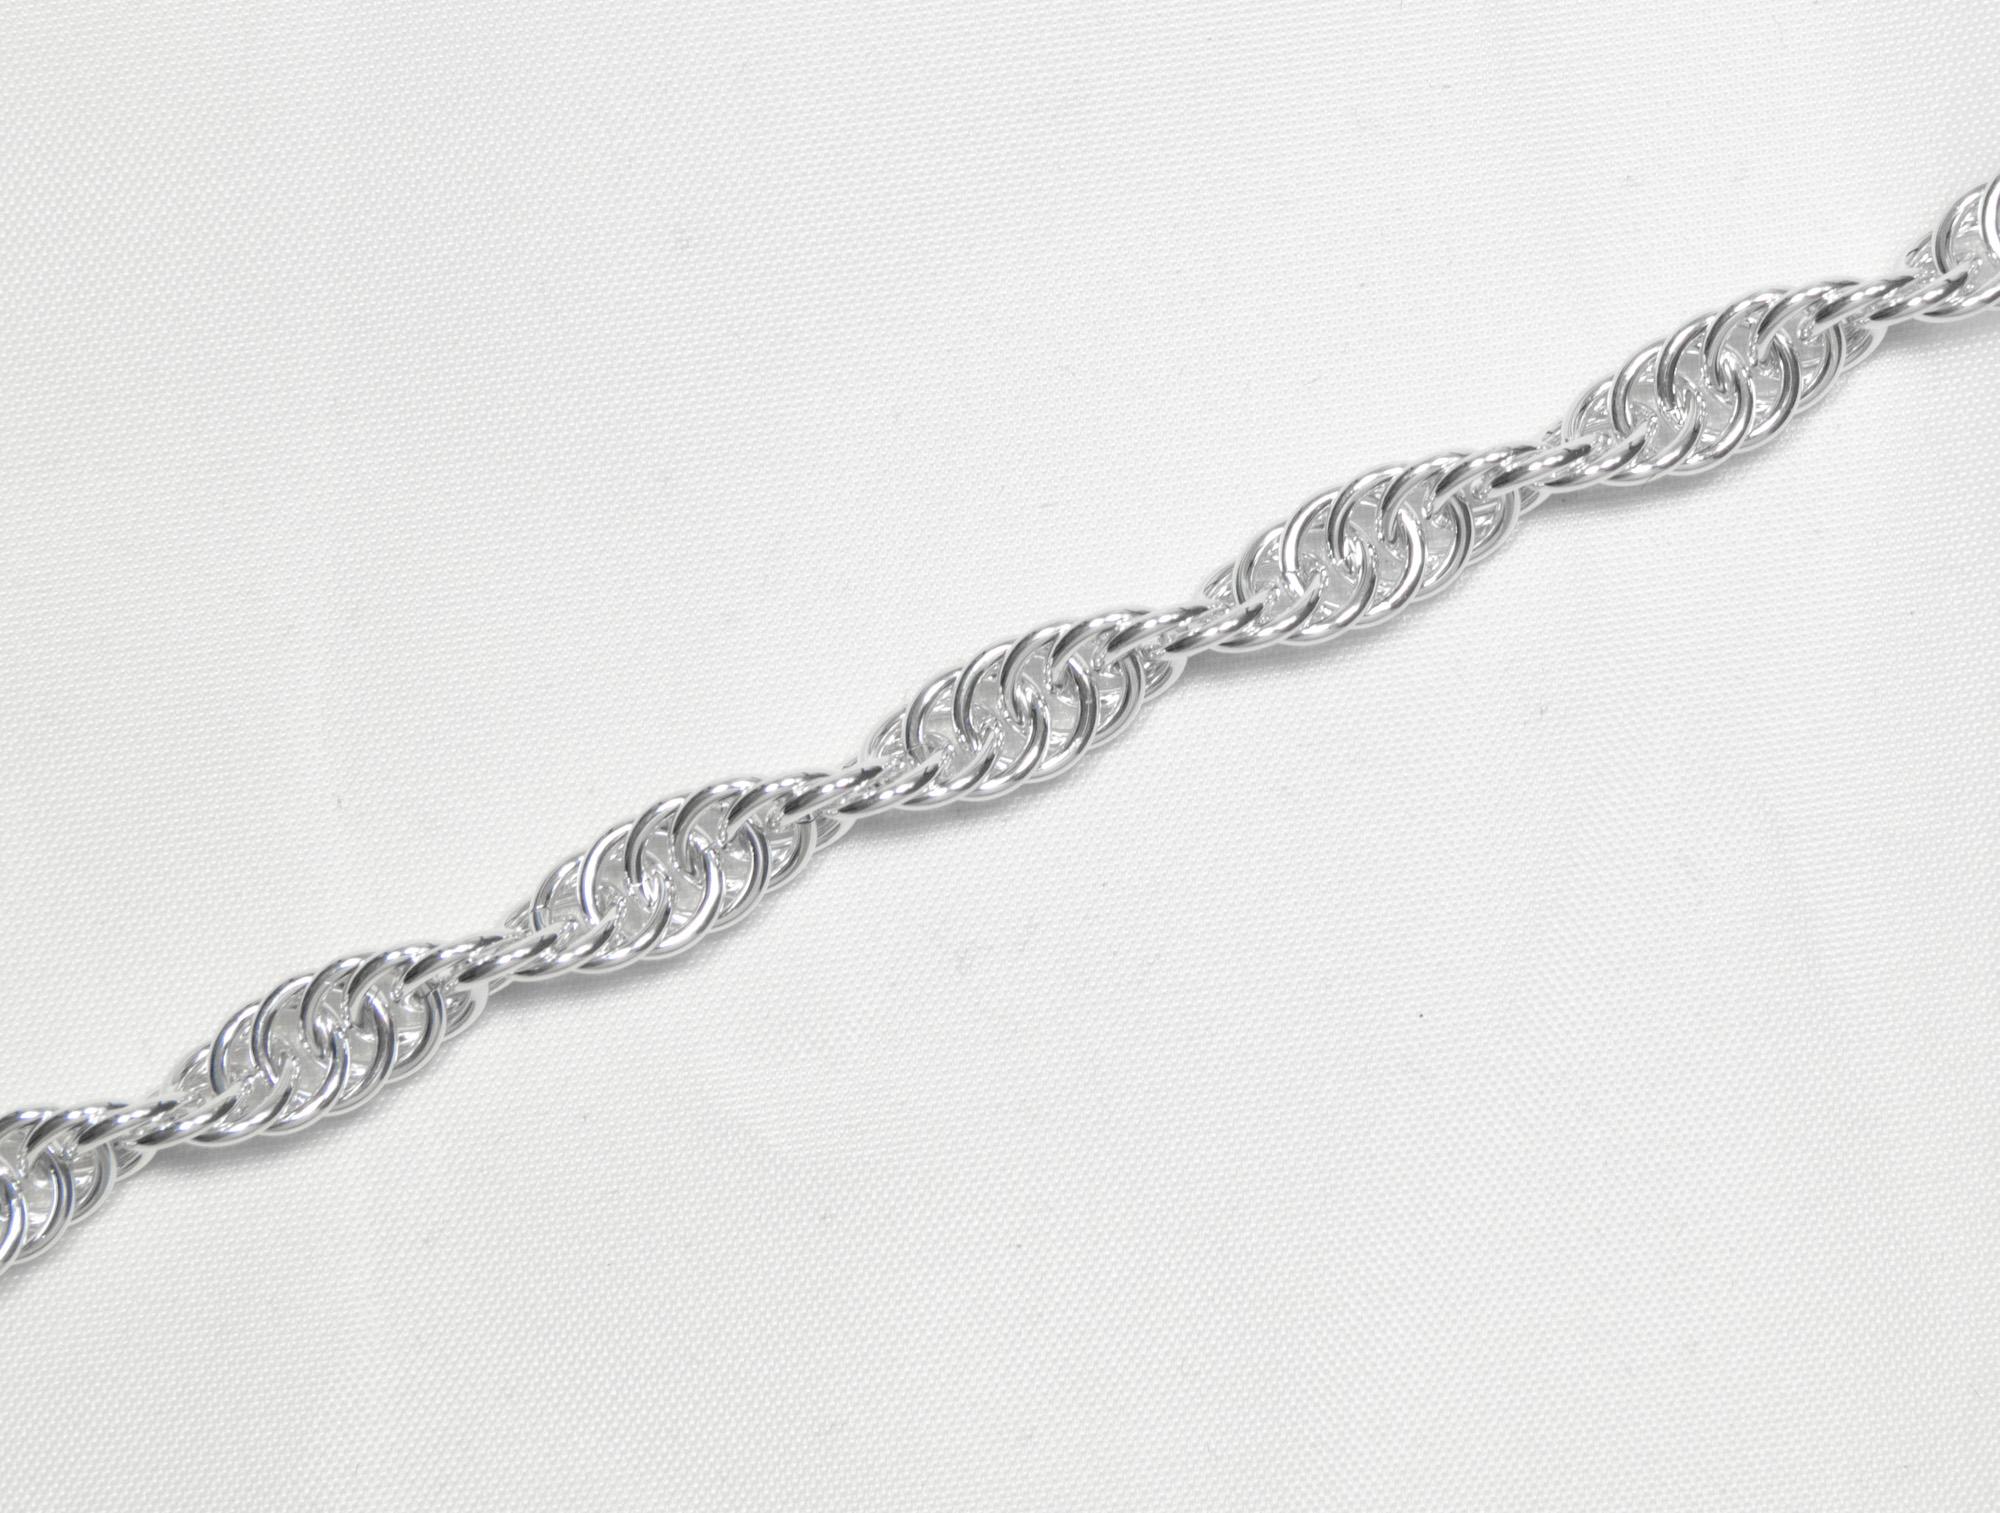 Rep - kjede sølv